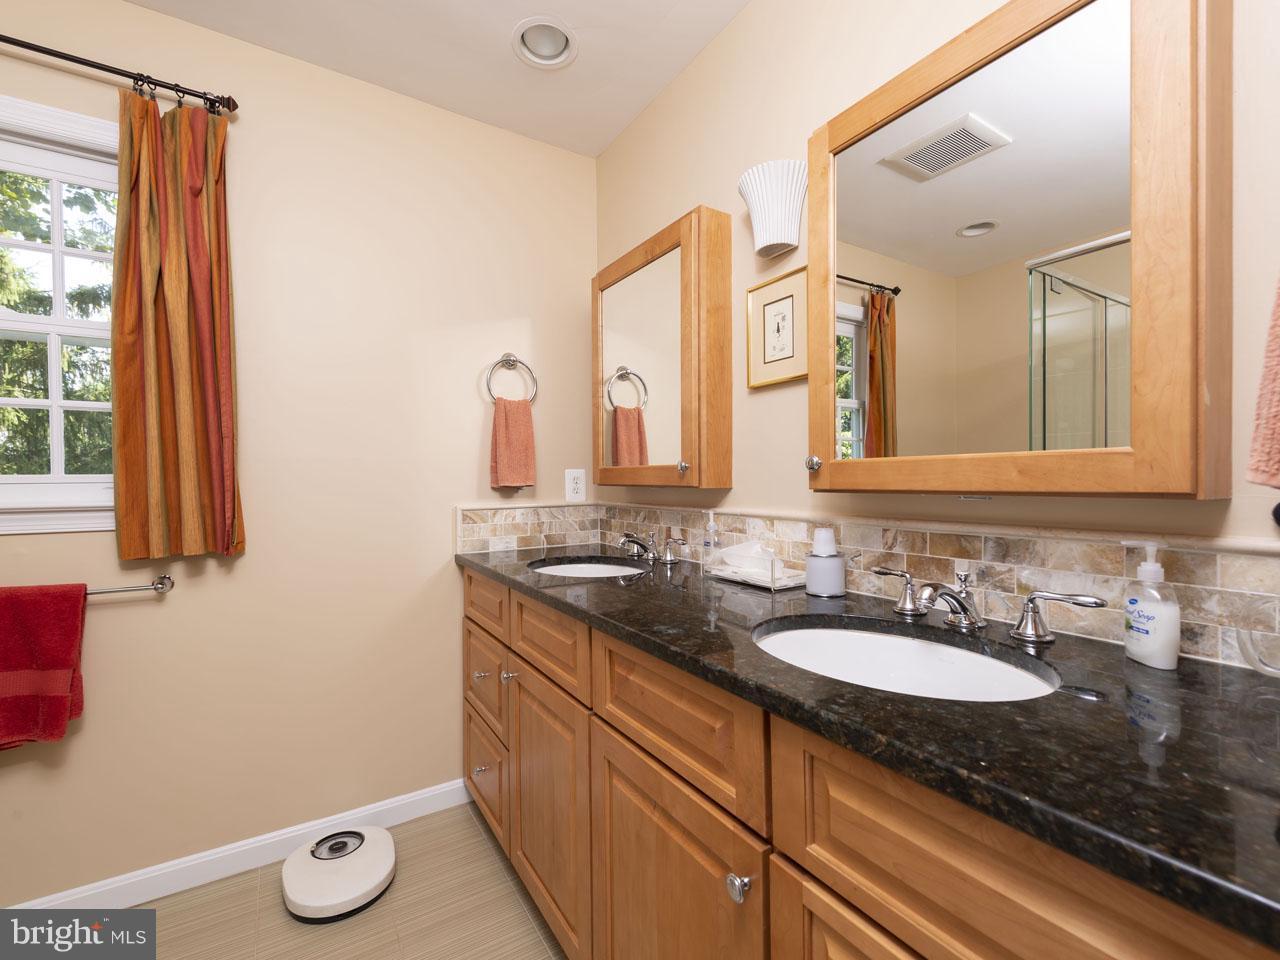 1006211278-300688039350-2021-07-22-07-39-39        Burke Delaware Real Estate For Sale   MLS# 1006211278  - Best of Northern Virginia